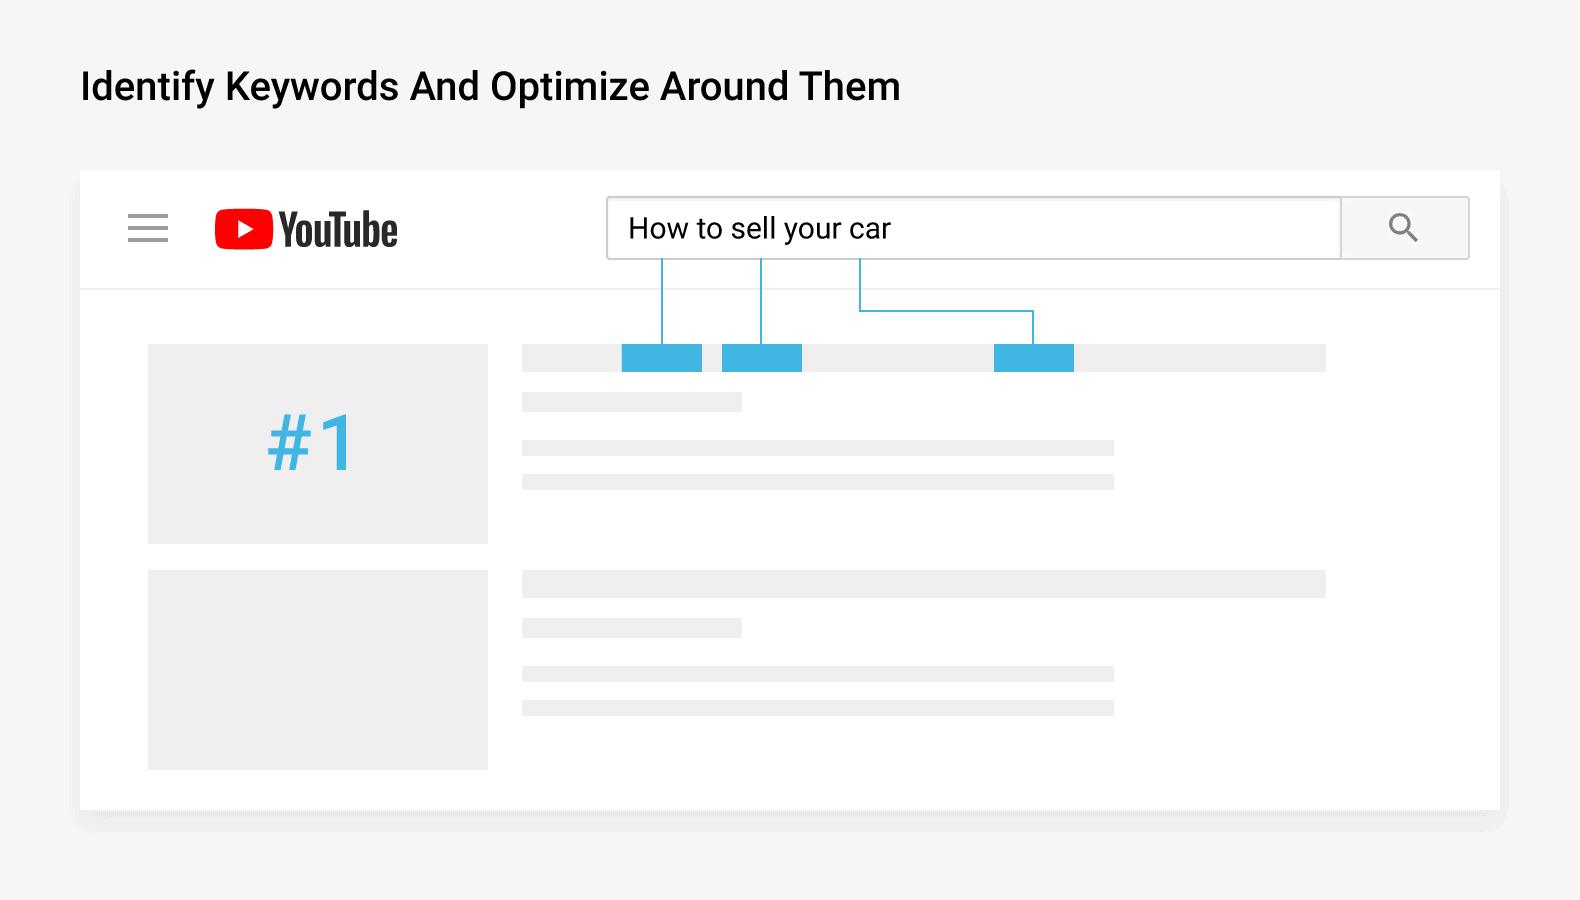 Identify keywords and optimize around them